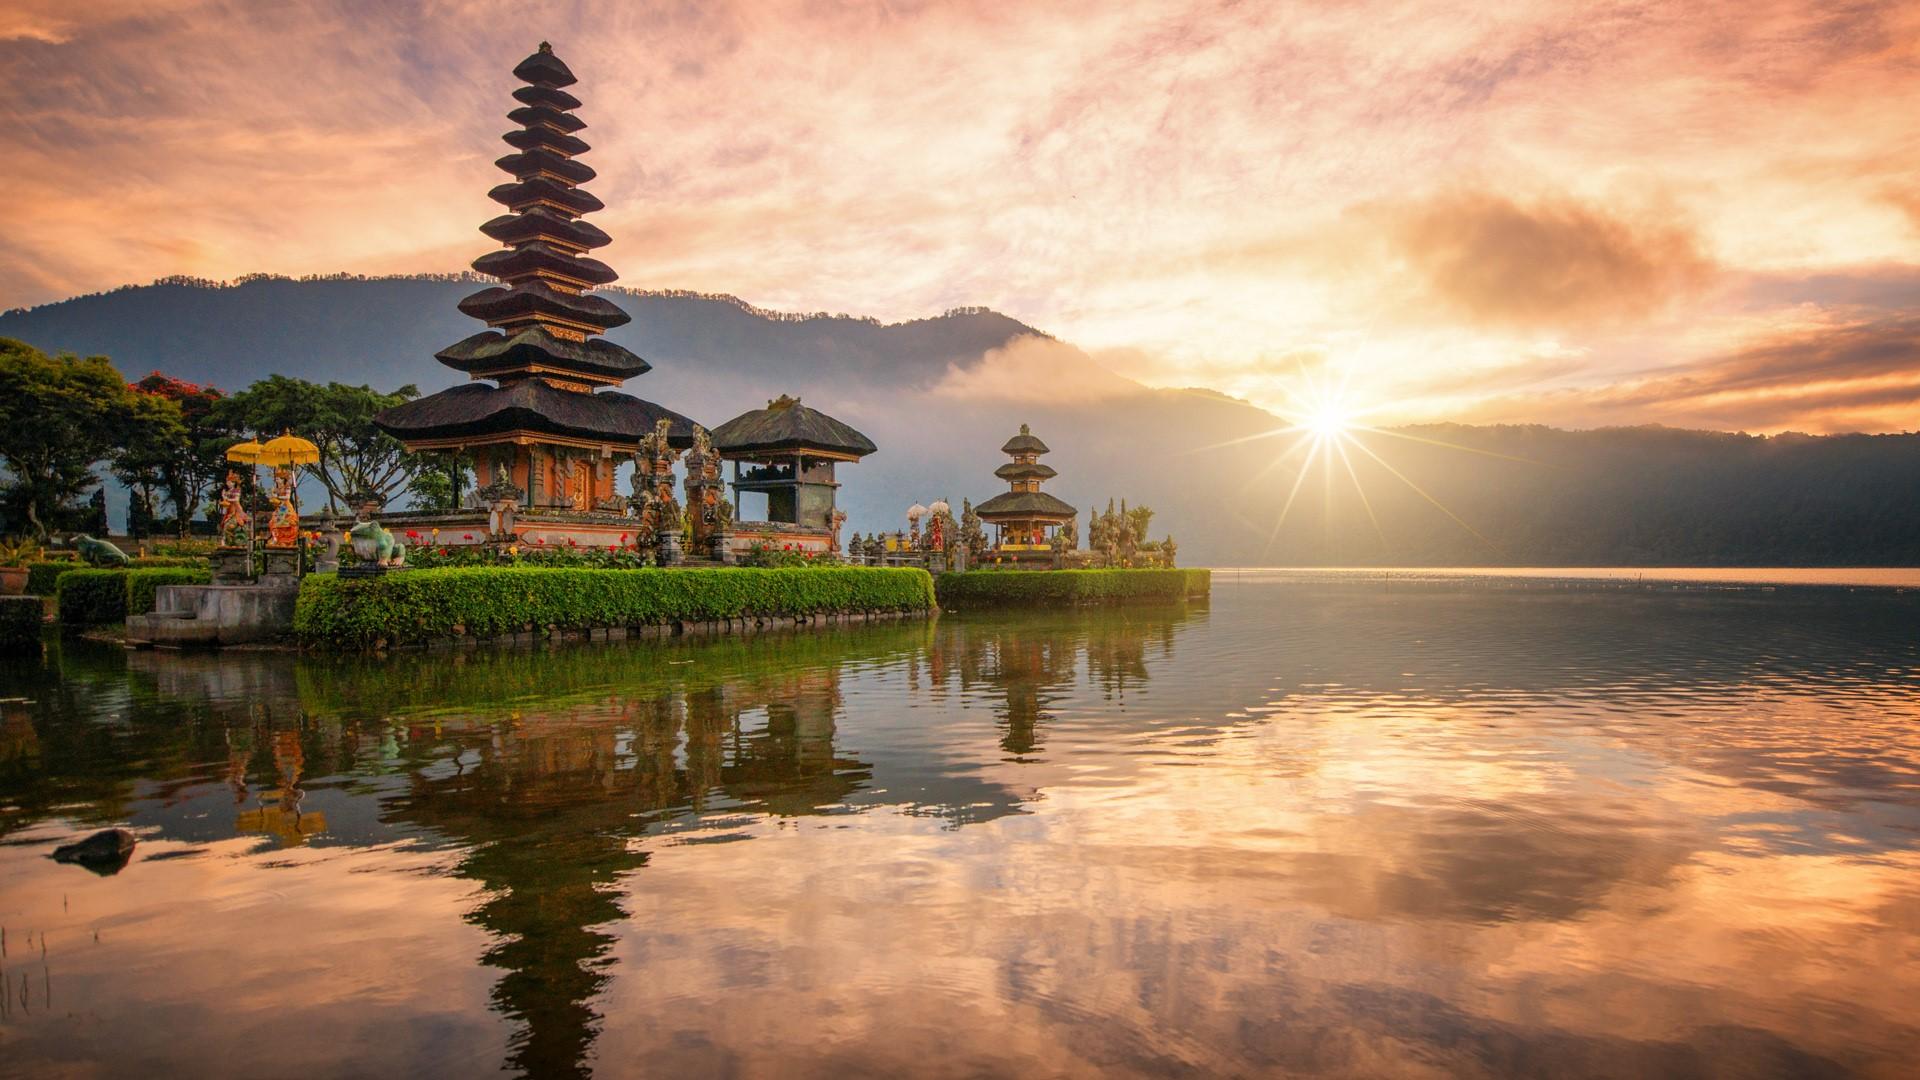 Templo Pura Ulun Danu en el Lago Bratan, Bali